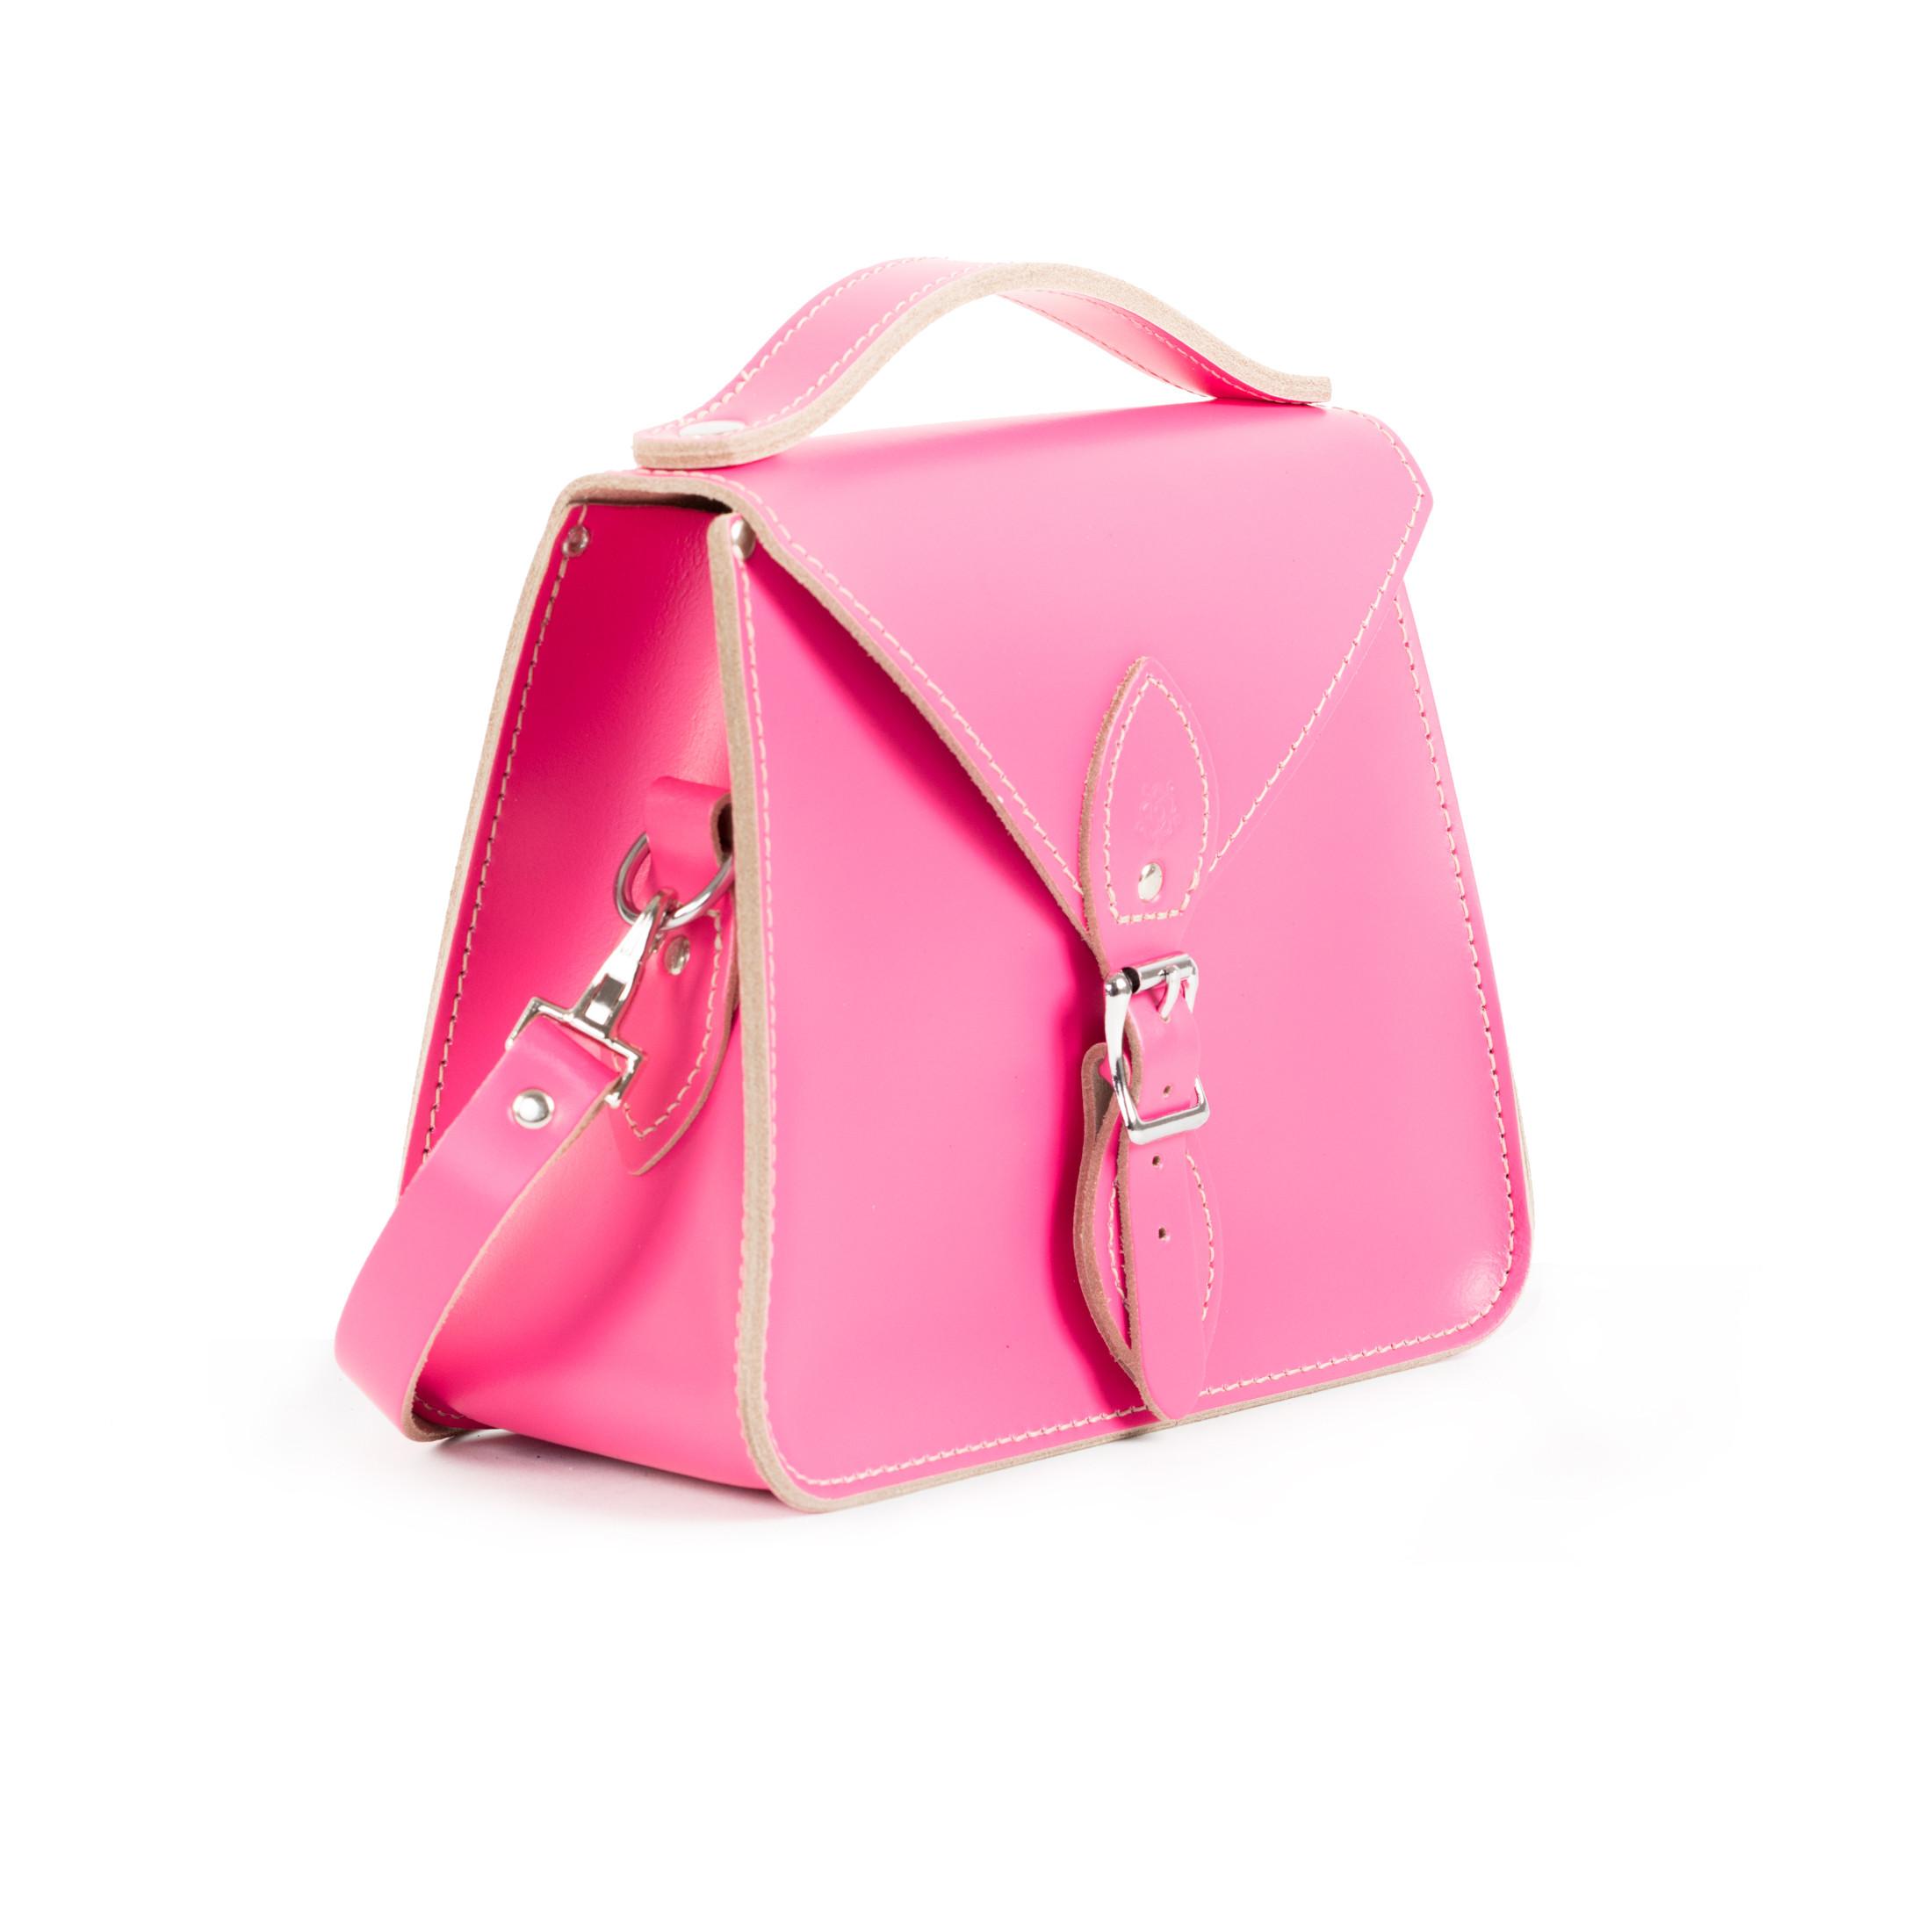 Esme Premium Leather Crossbody Bag in Bright Pink